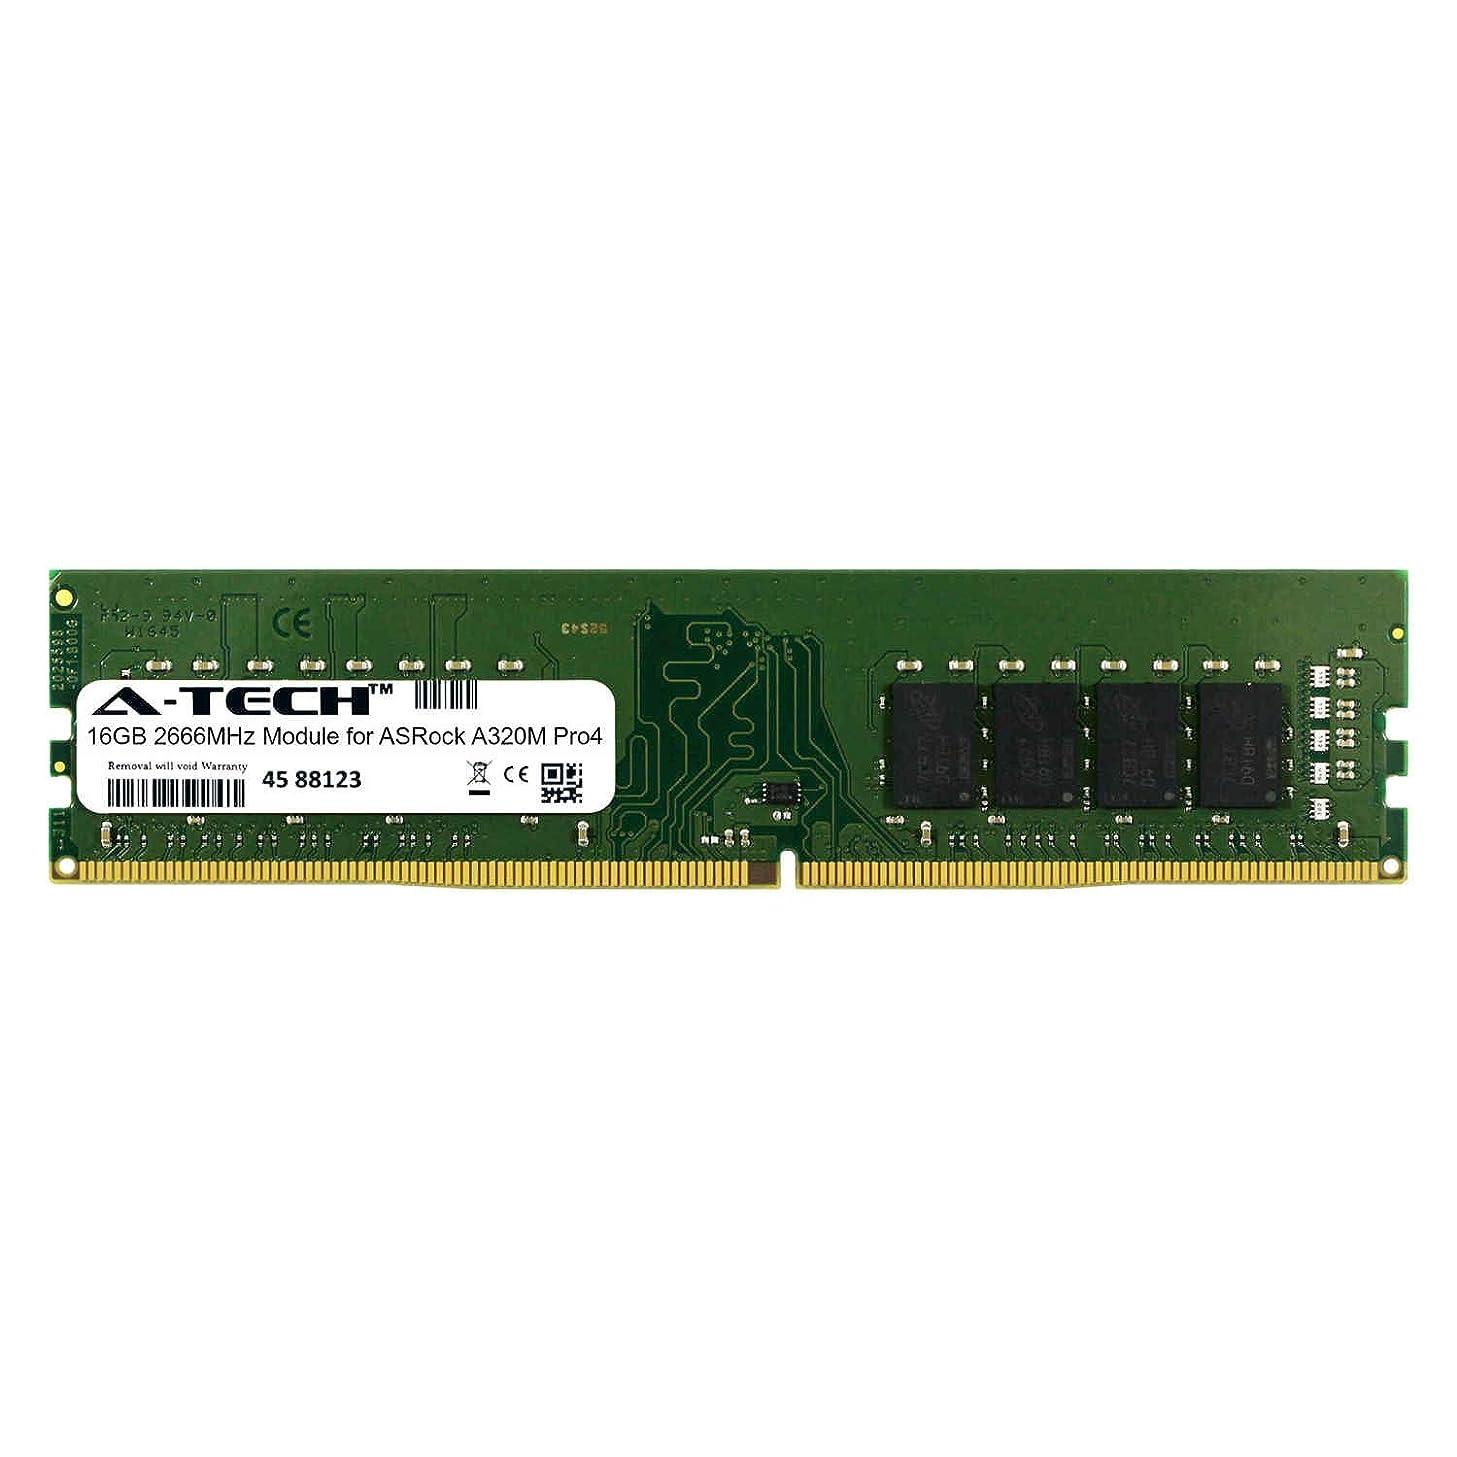 A-Tech 16GB Module for ASRock A320M Pro4 Desktop & Workstation Motherboard Compatible DDR4 2666Mhz Memory Ram (ATMS395910A25823X1) mlajtj7238484